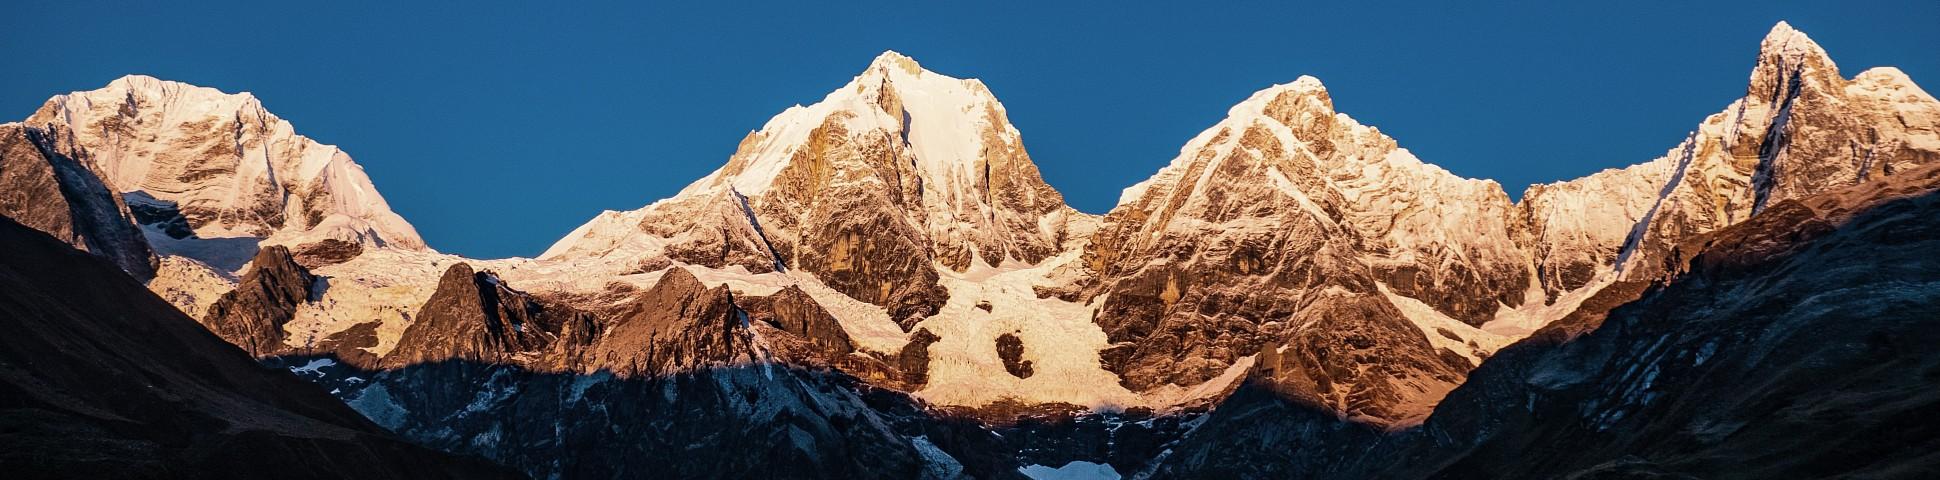 Cordillera Huayhuash in Peru